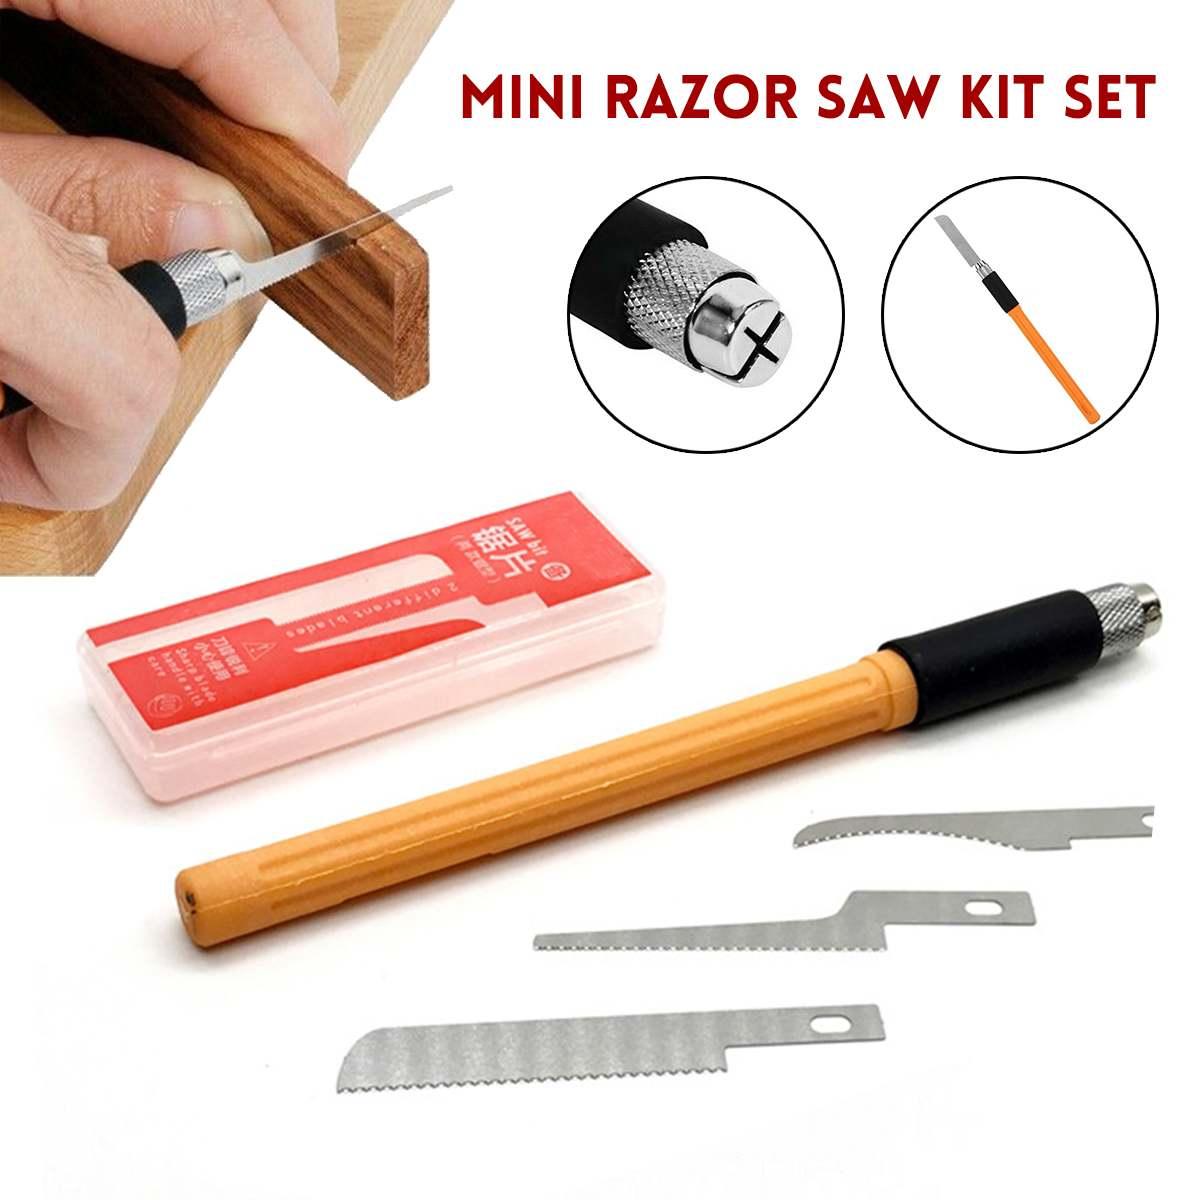 Mini Razor Saw Set Home DIY Handy Multifunction Craft Saw Blade Model Making Woodworking Handcraft Tools Dropshipping 2020